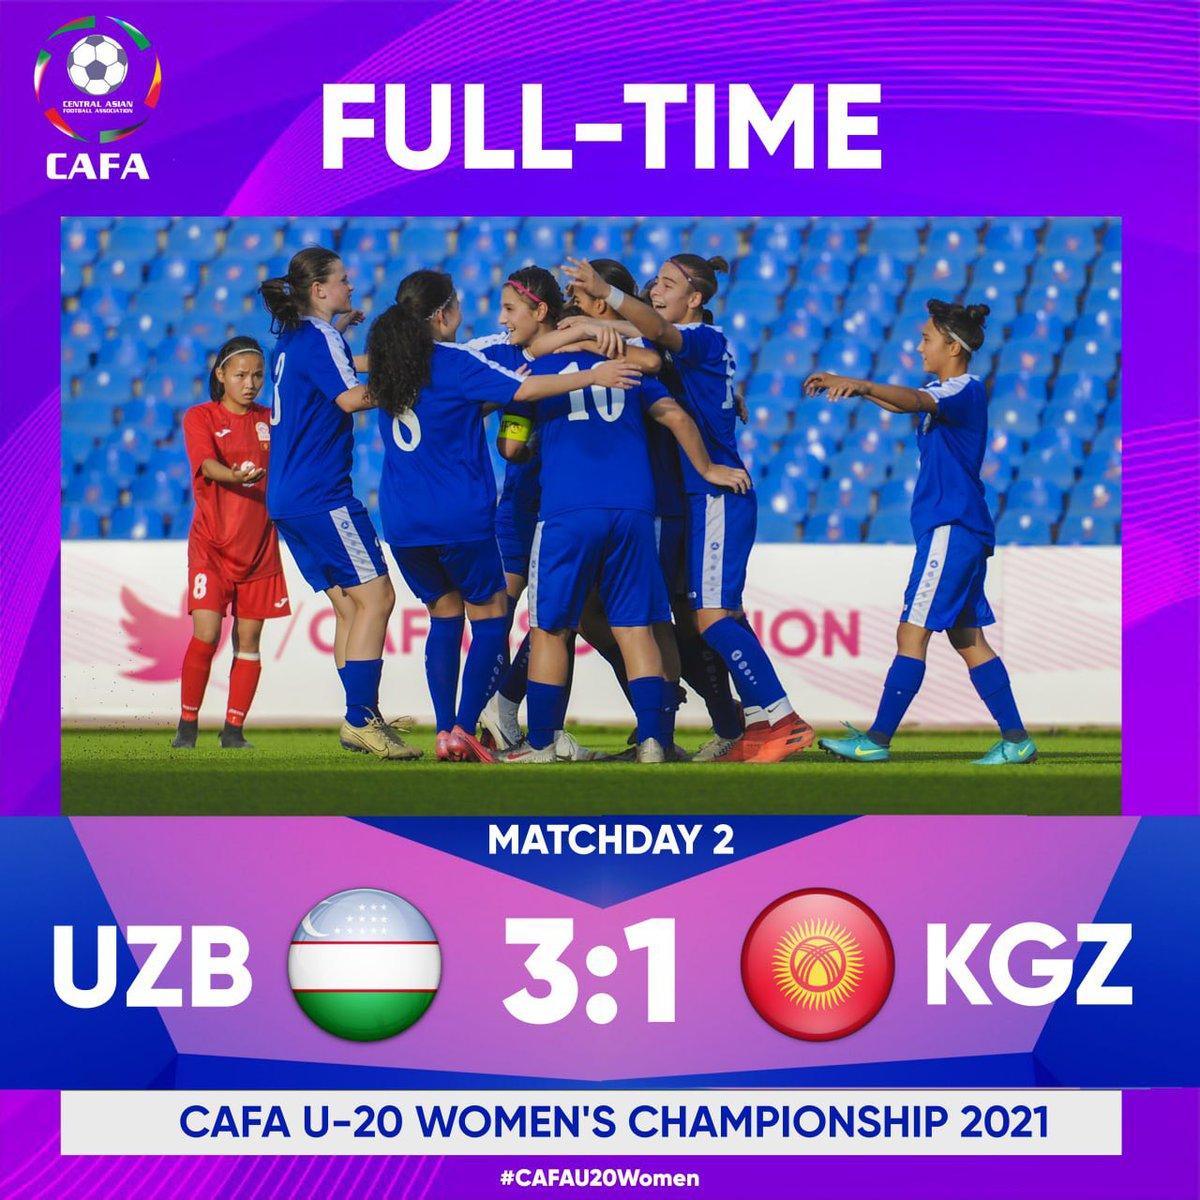 CAFA U-20 Women's Championship 2021  FULL TIME   MD 2  🇺🇿 Uzbekistan 3:1 Kyrgyz Republic 🇰🇬  @cafassociation   #CAFAU20Women #Afghanistan #Iran #KyrgyzRepublic #Tajikistan #Uzbekistan https://t.co/Ss8PvQsFMP